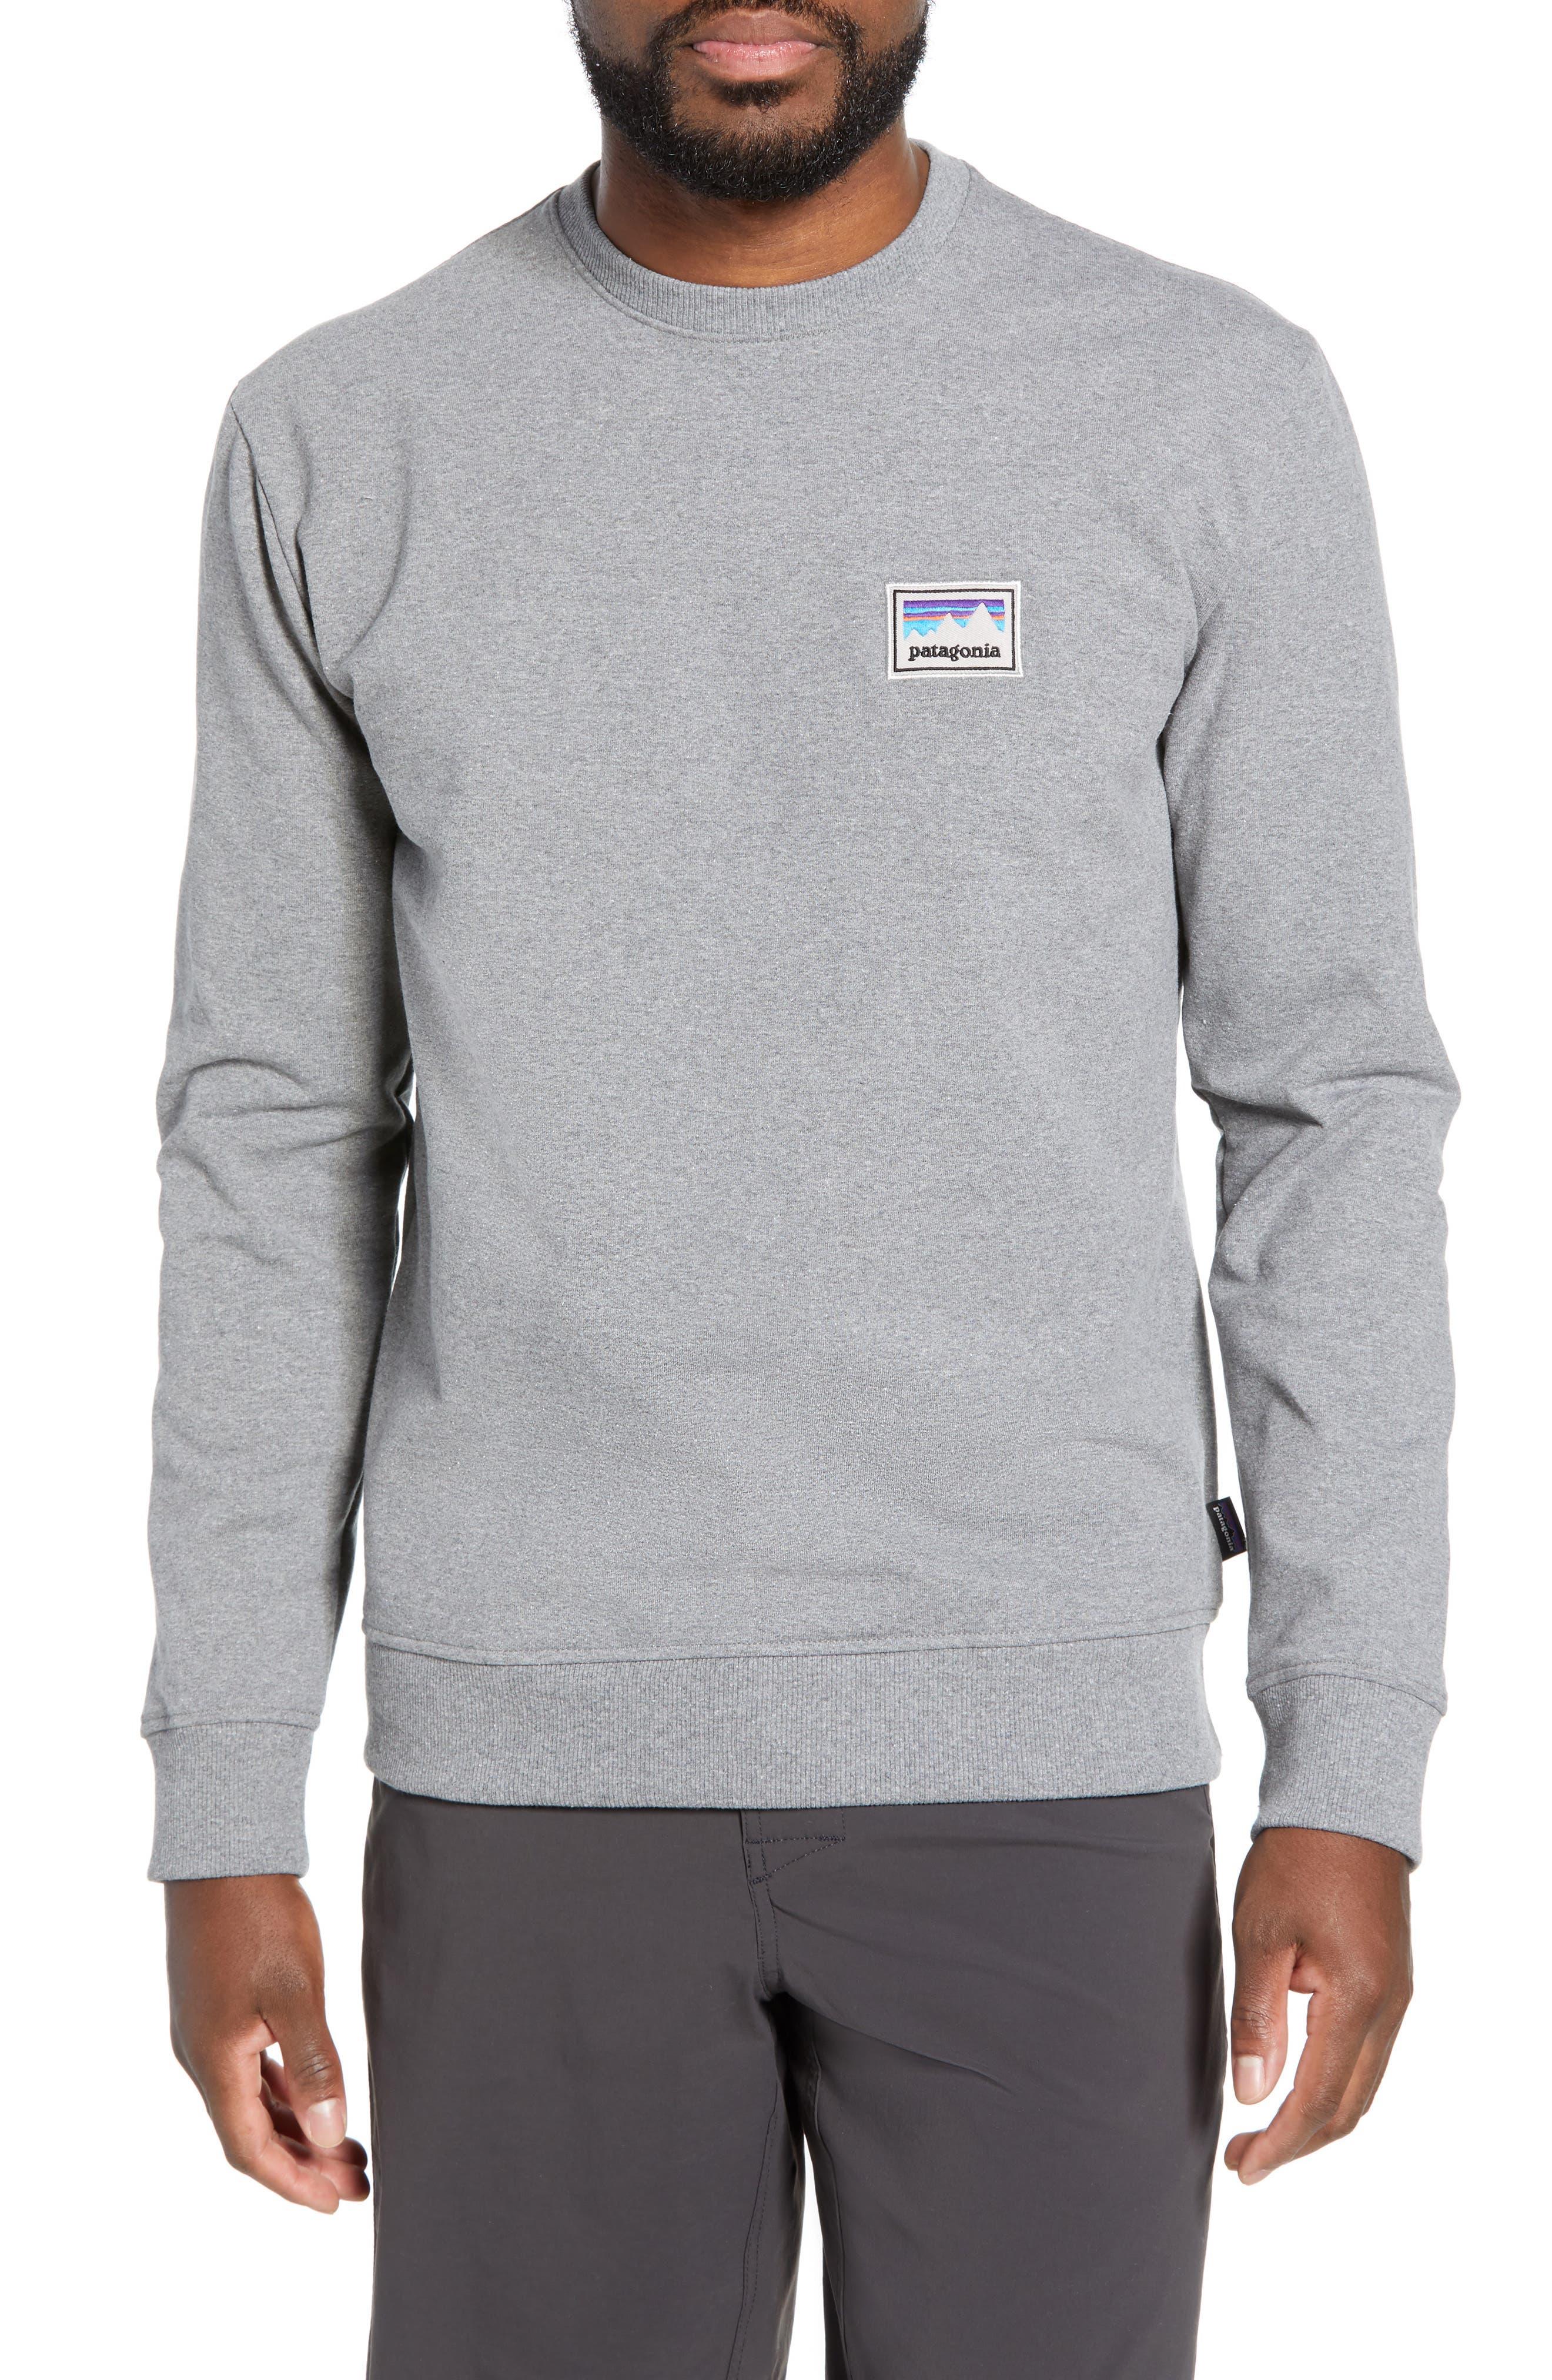 Shop Sticker Patch Uprisal Crew Sweatshirt, Main, color, GRAVEL HEATHER